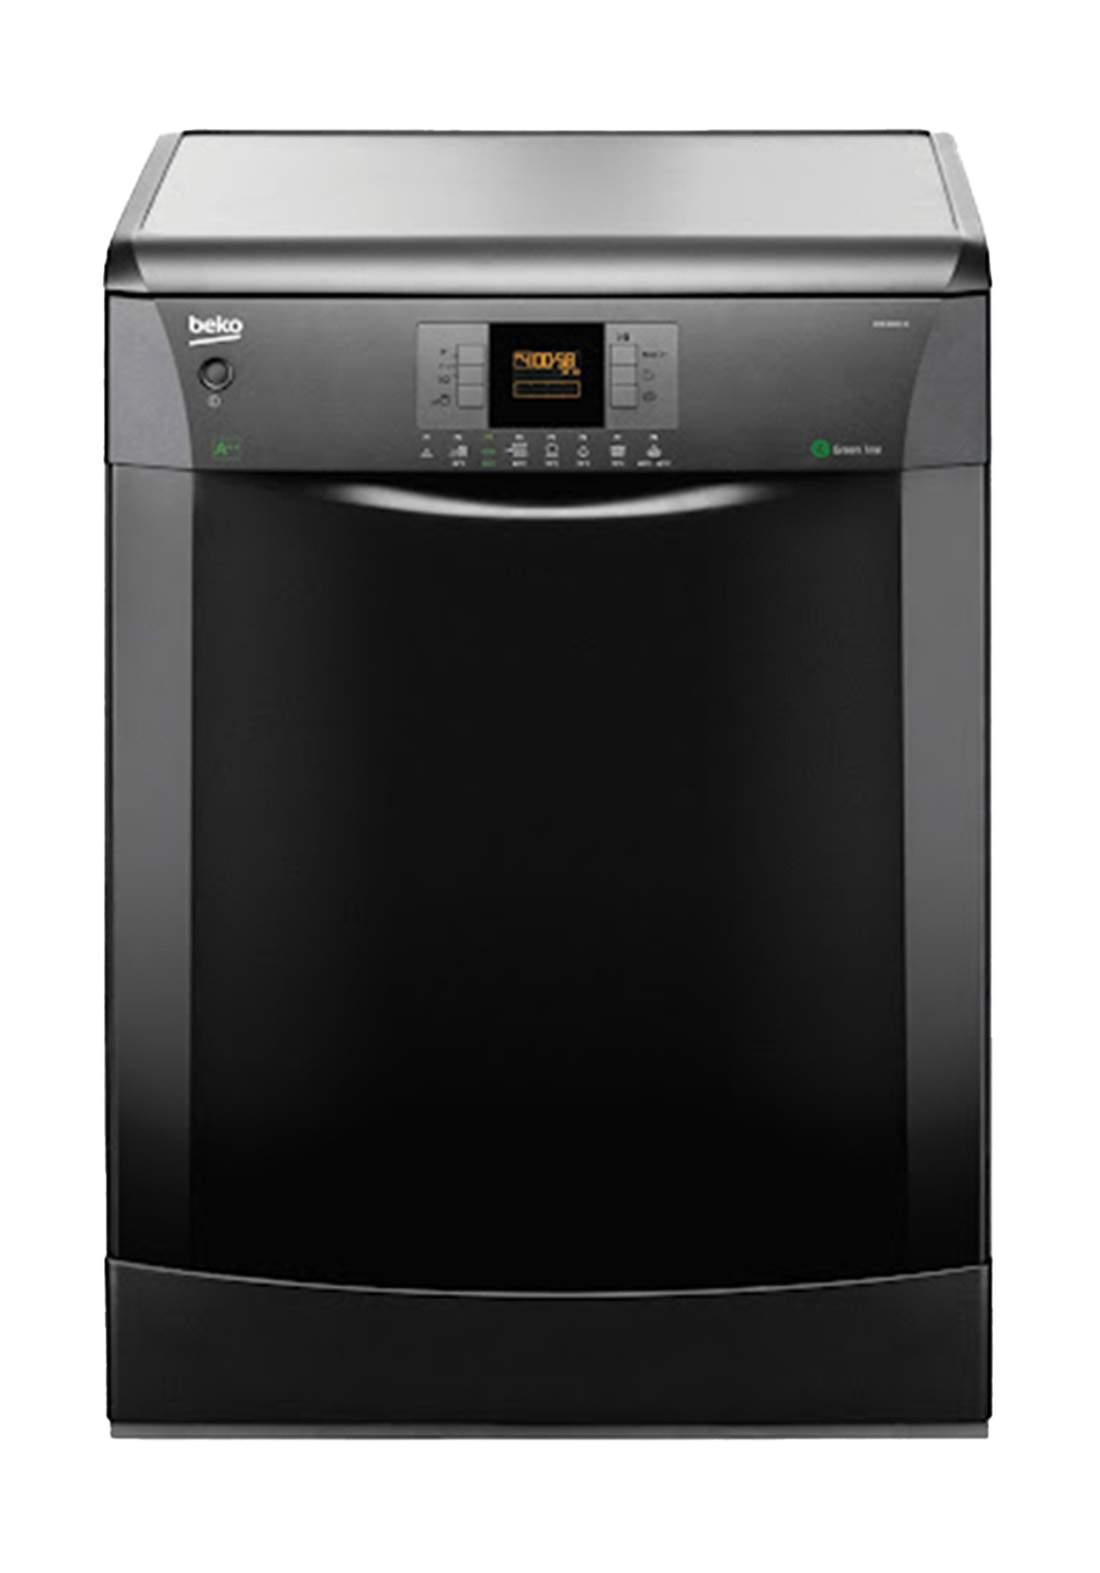 Beko  DFN 6833B Dishwasher Built-in 8 Programs Capacity Of 14 Sets - Black  غسالة صحون